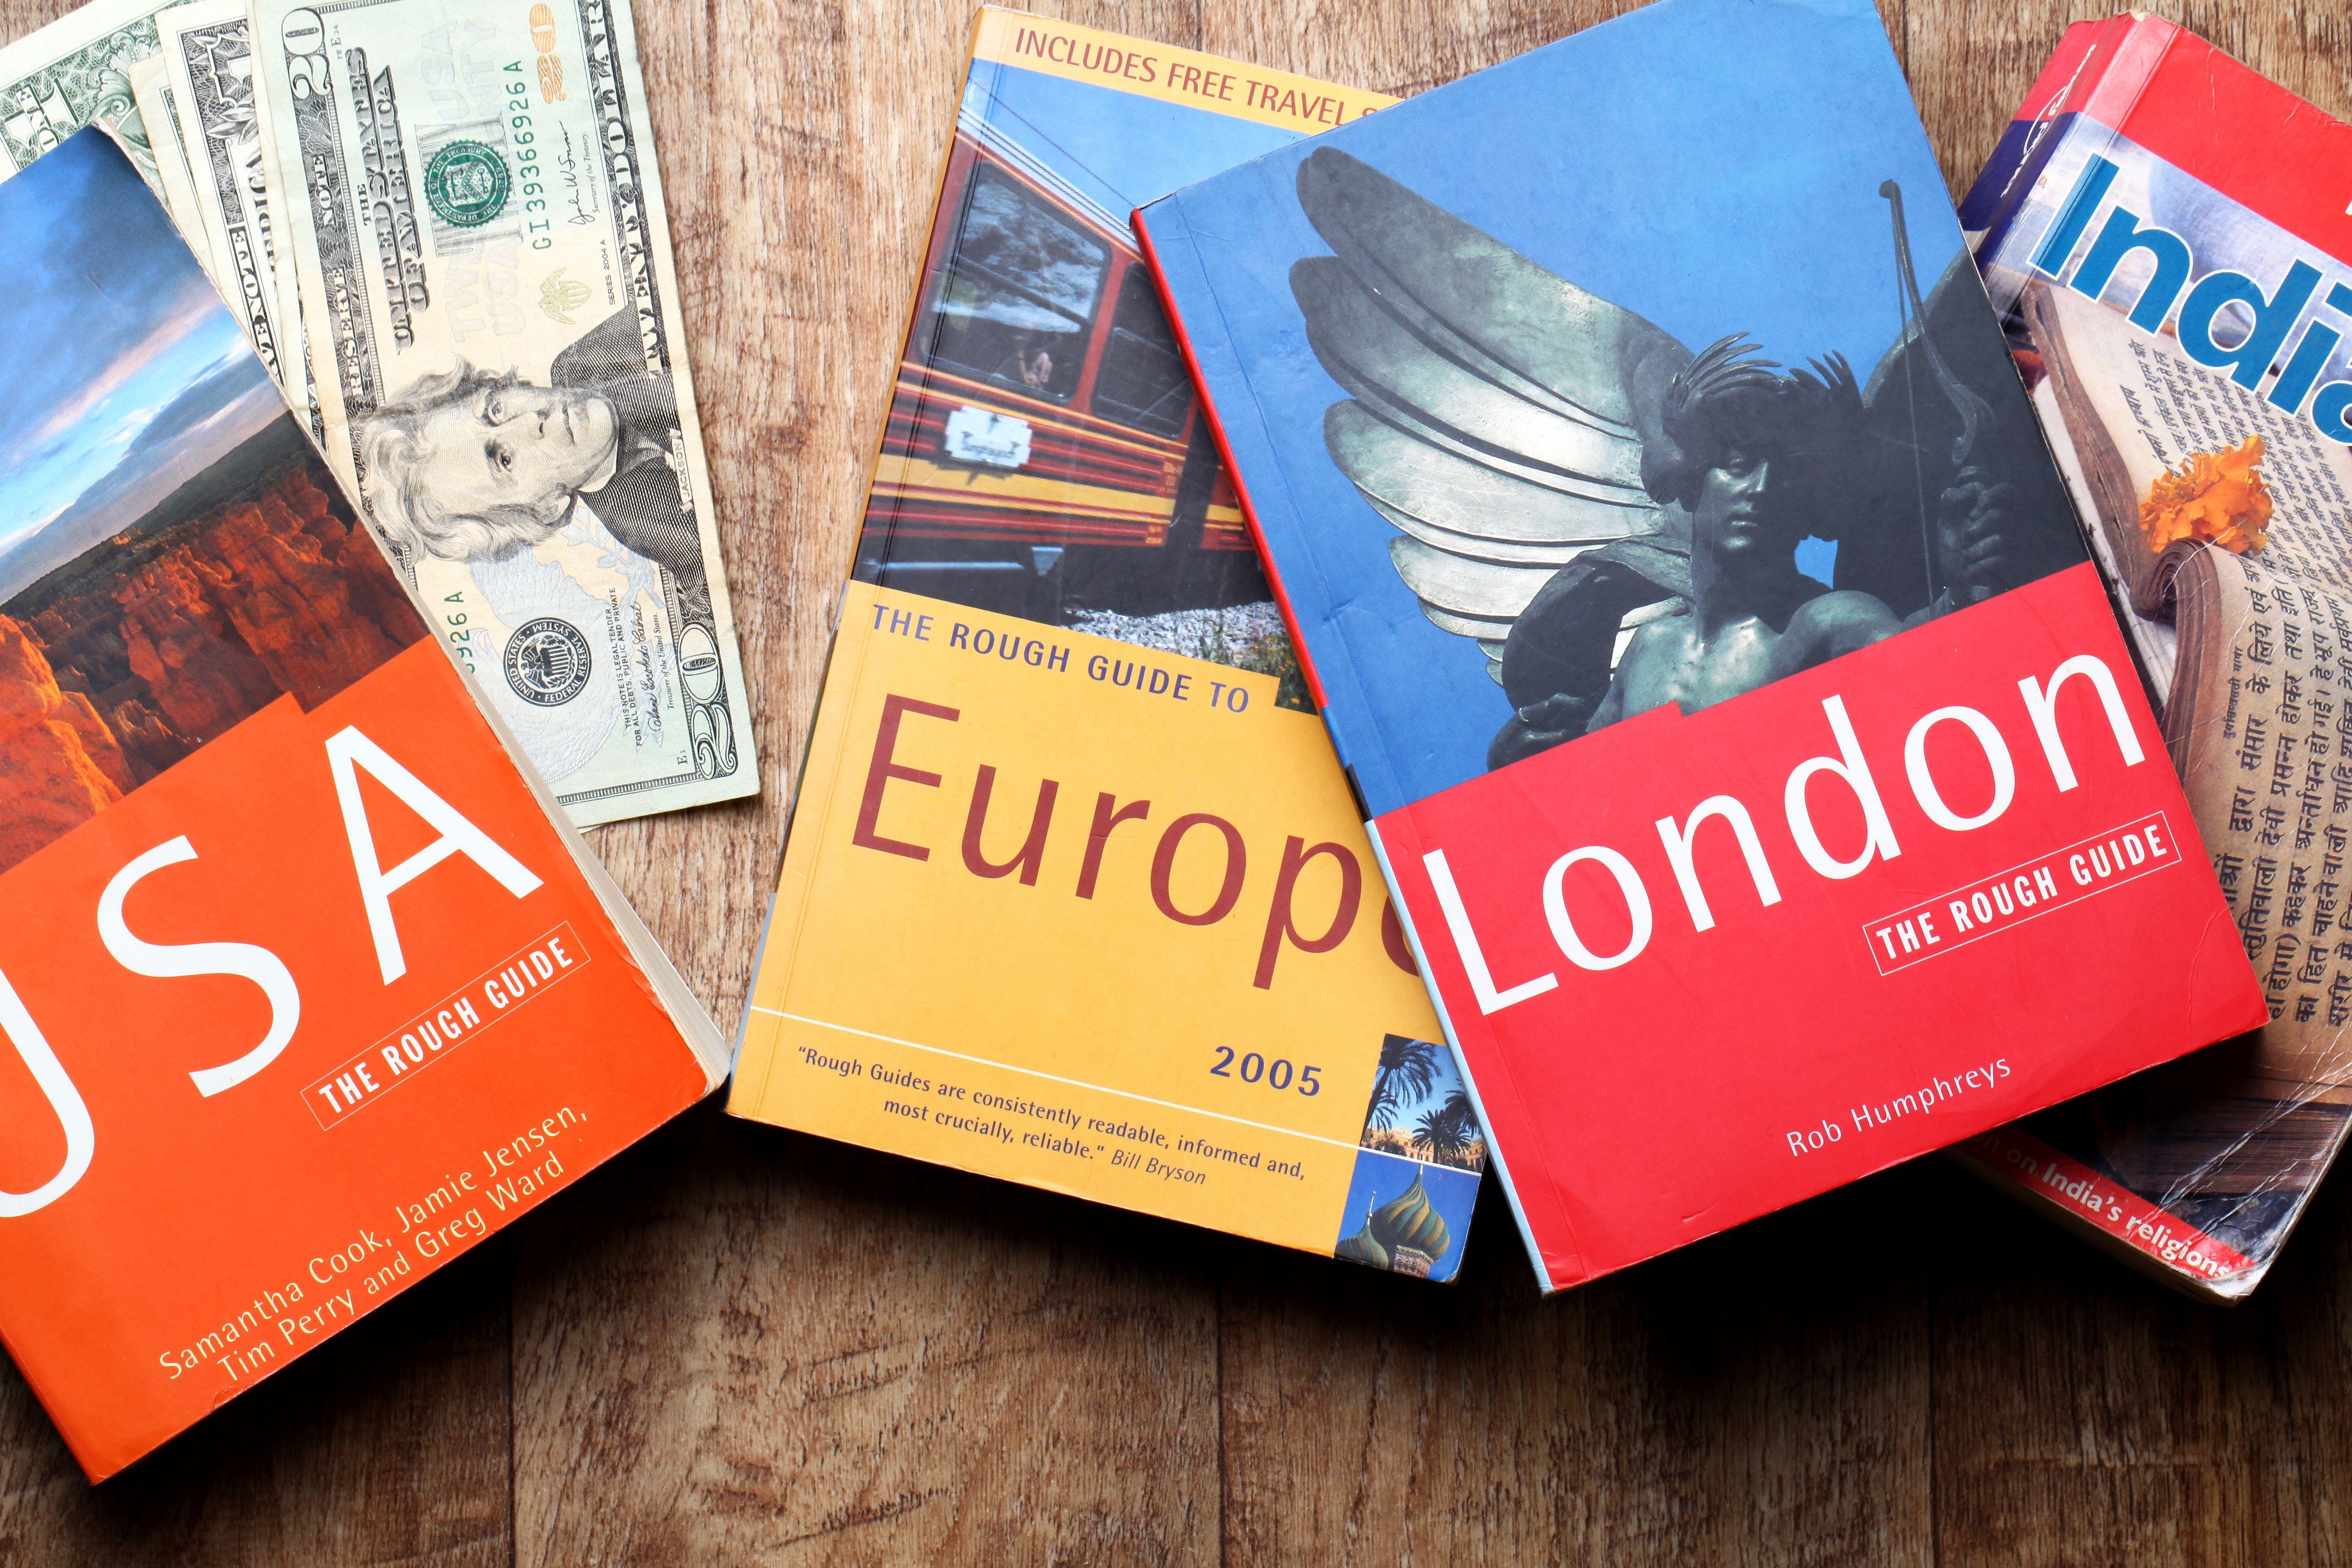 Travel guide books